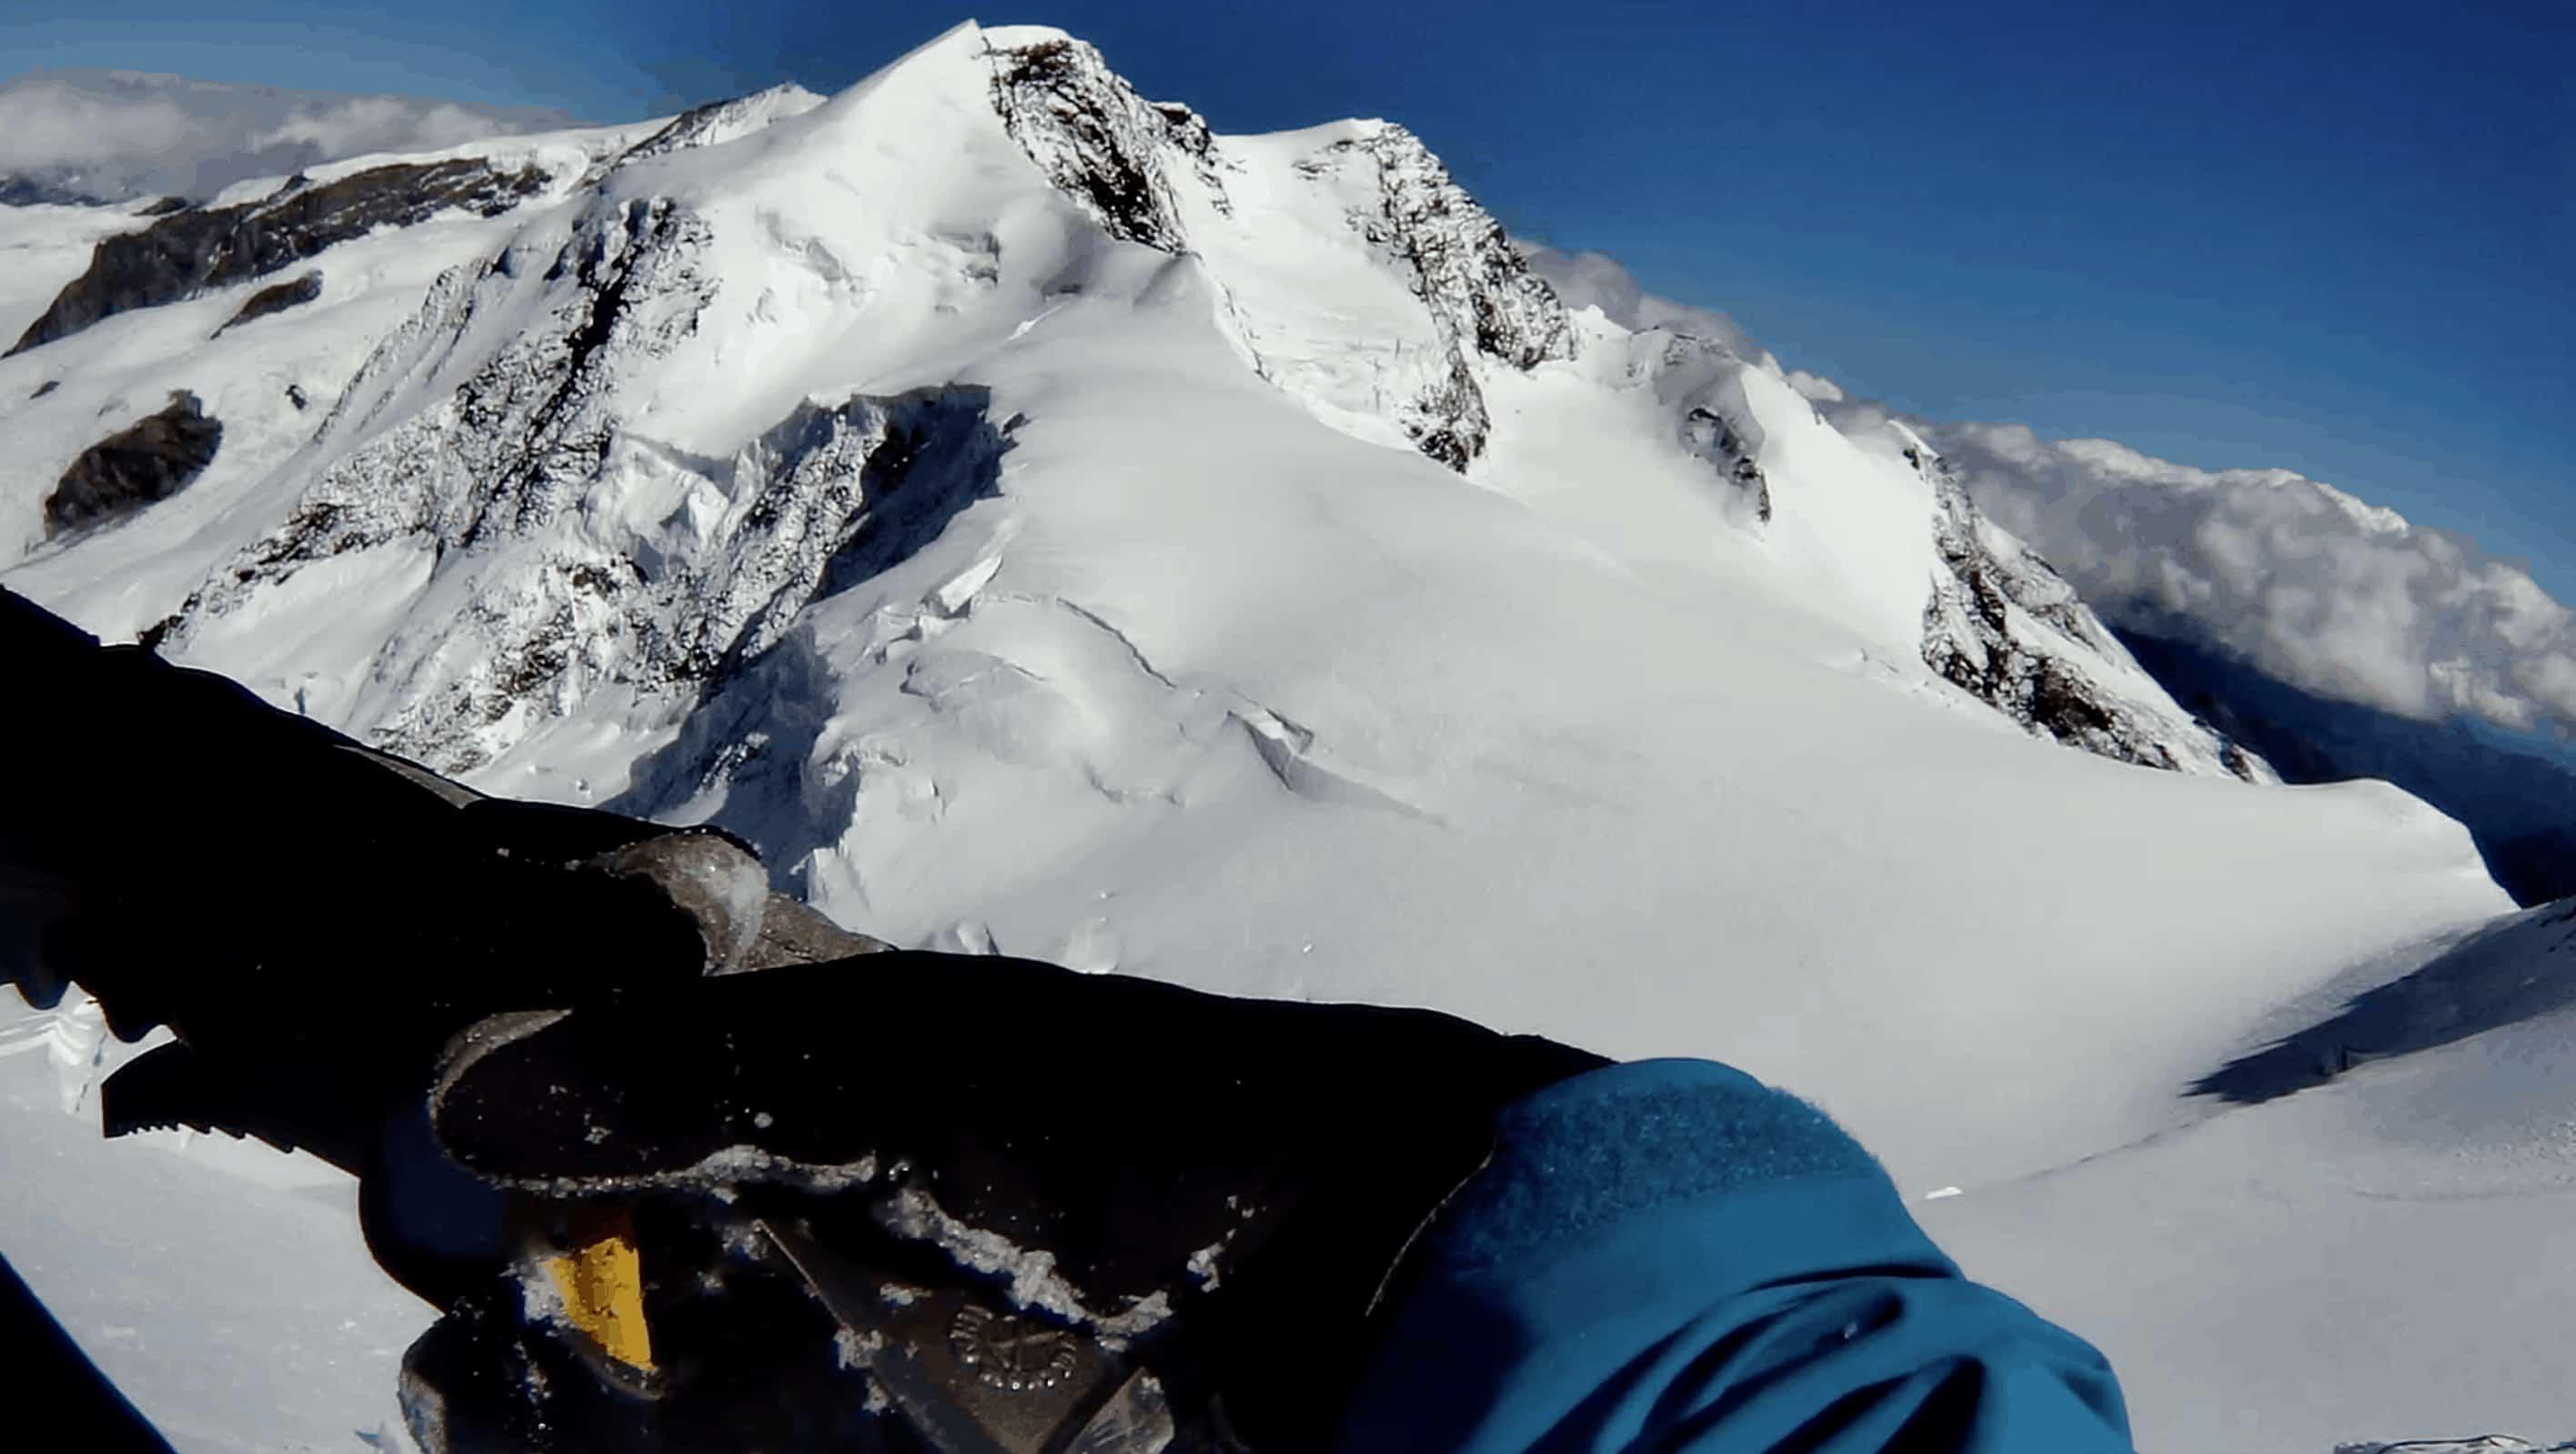 IMG 1467 - Training für die Berge - Berglauftraining